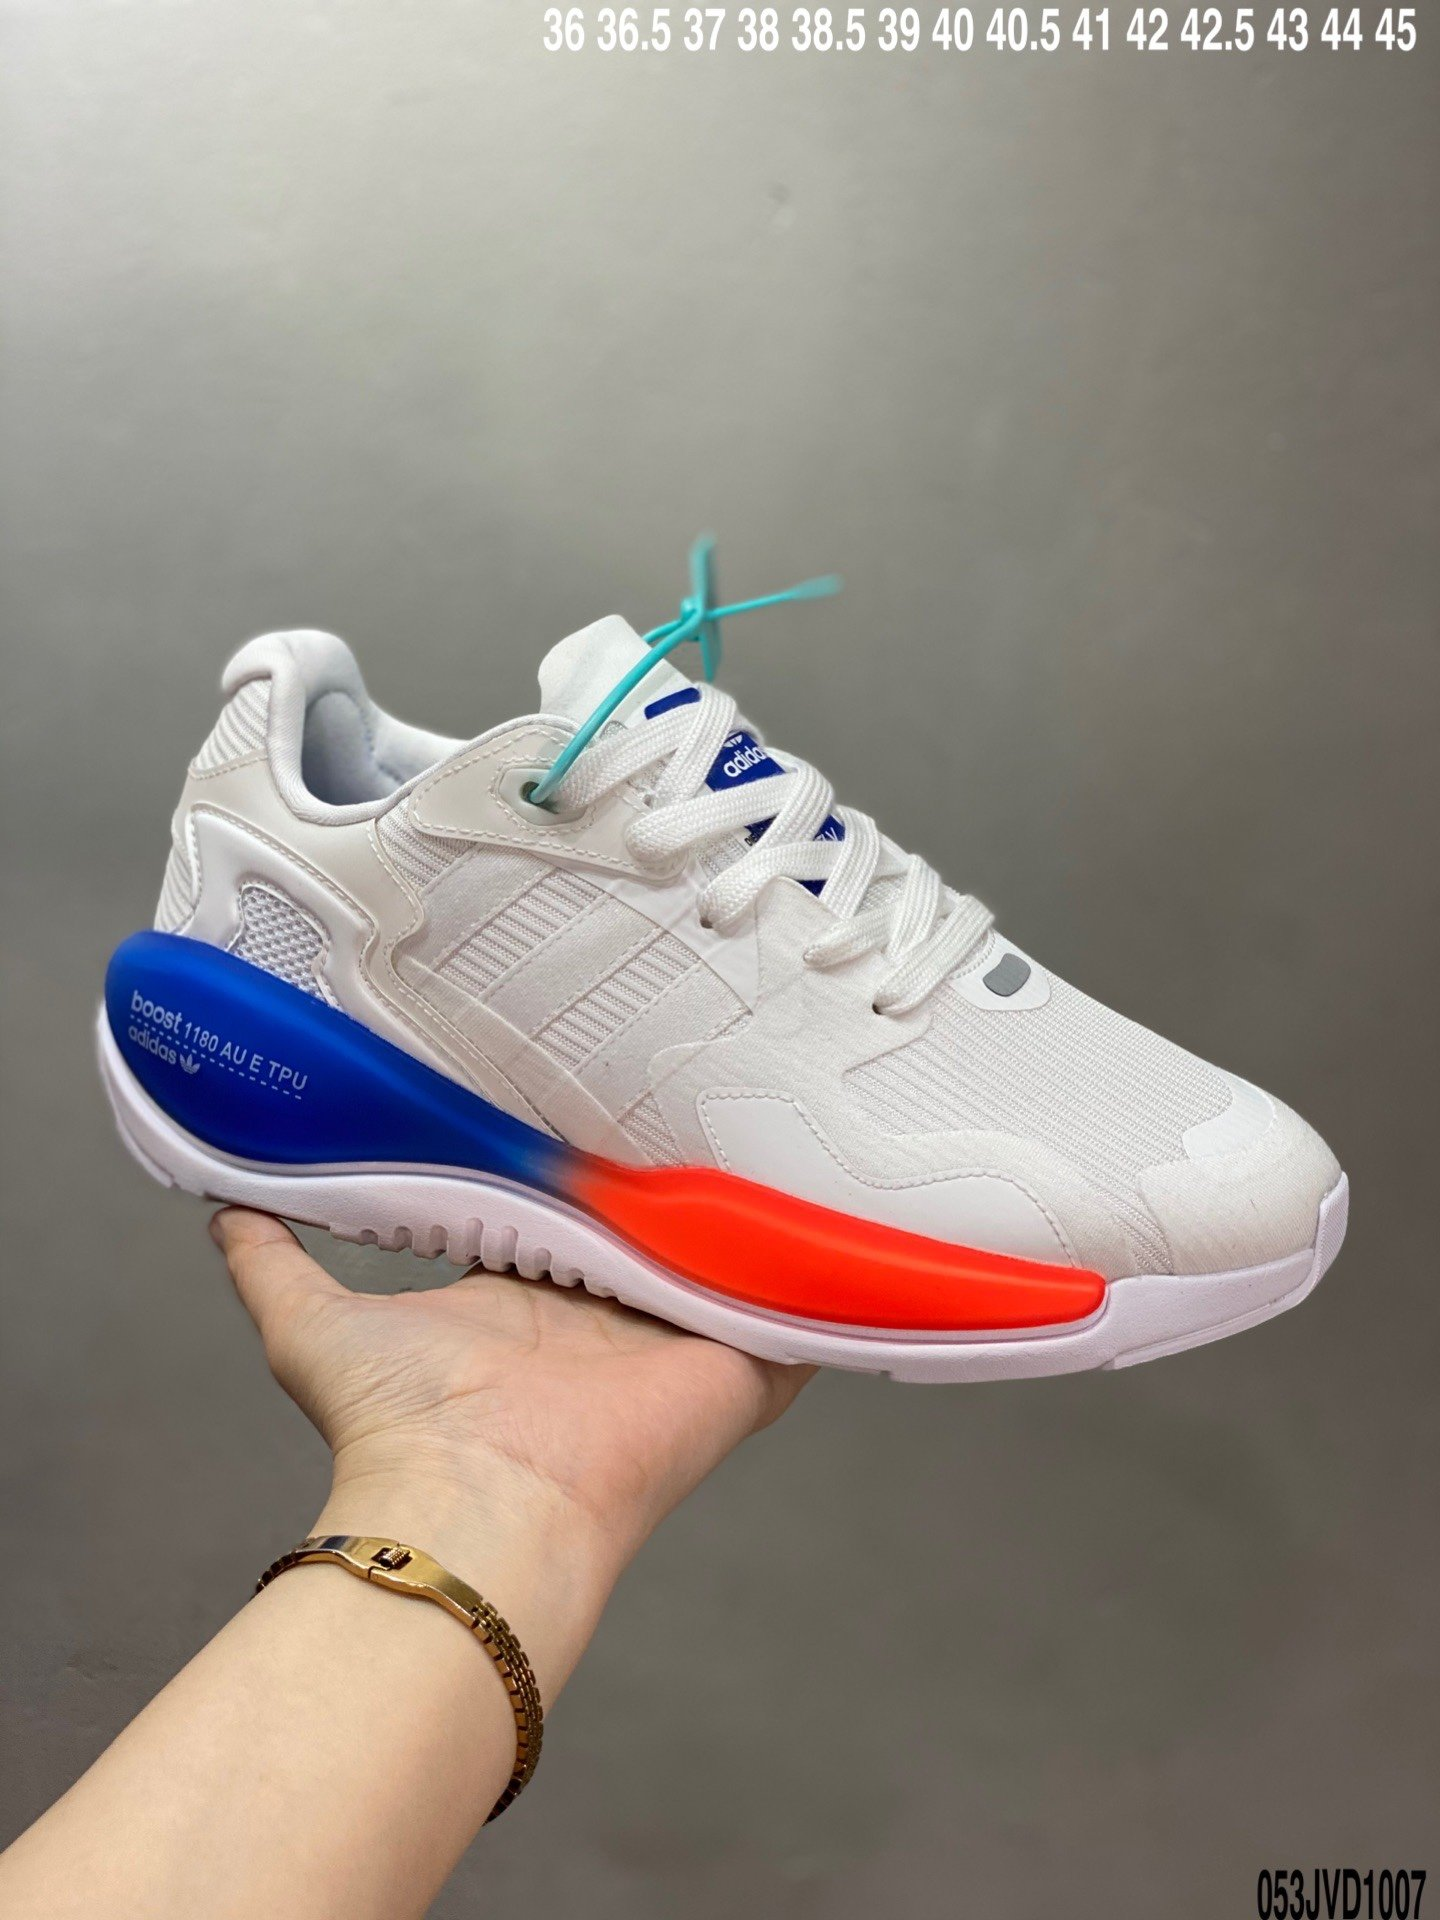 07081134540 - 运动跑鞋, 跑鞋, Originals ZX Alkyne Boost, Boost, Adidas